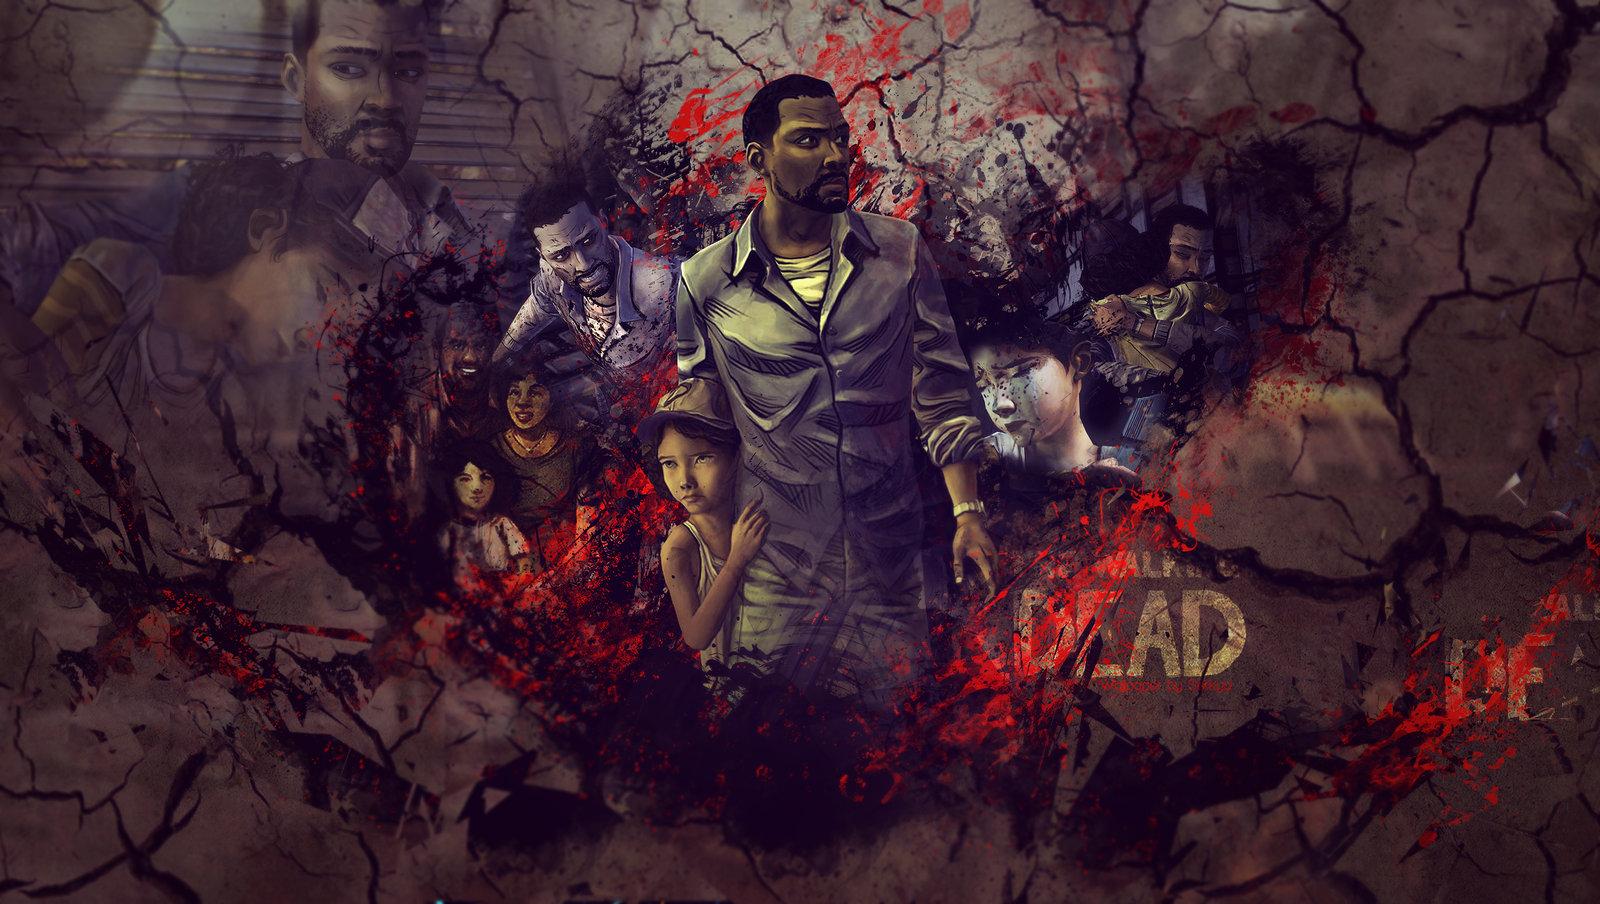 The Walking Dead Game Wallpaper